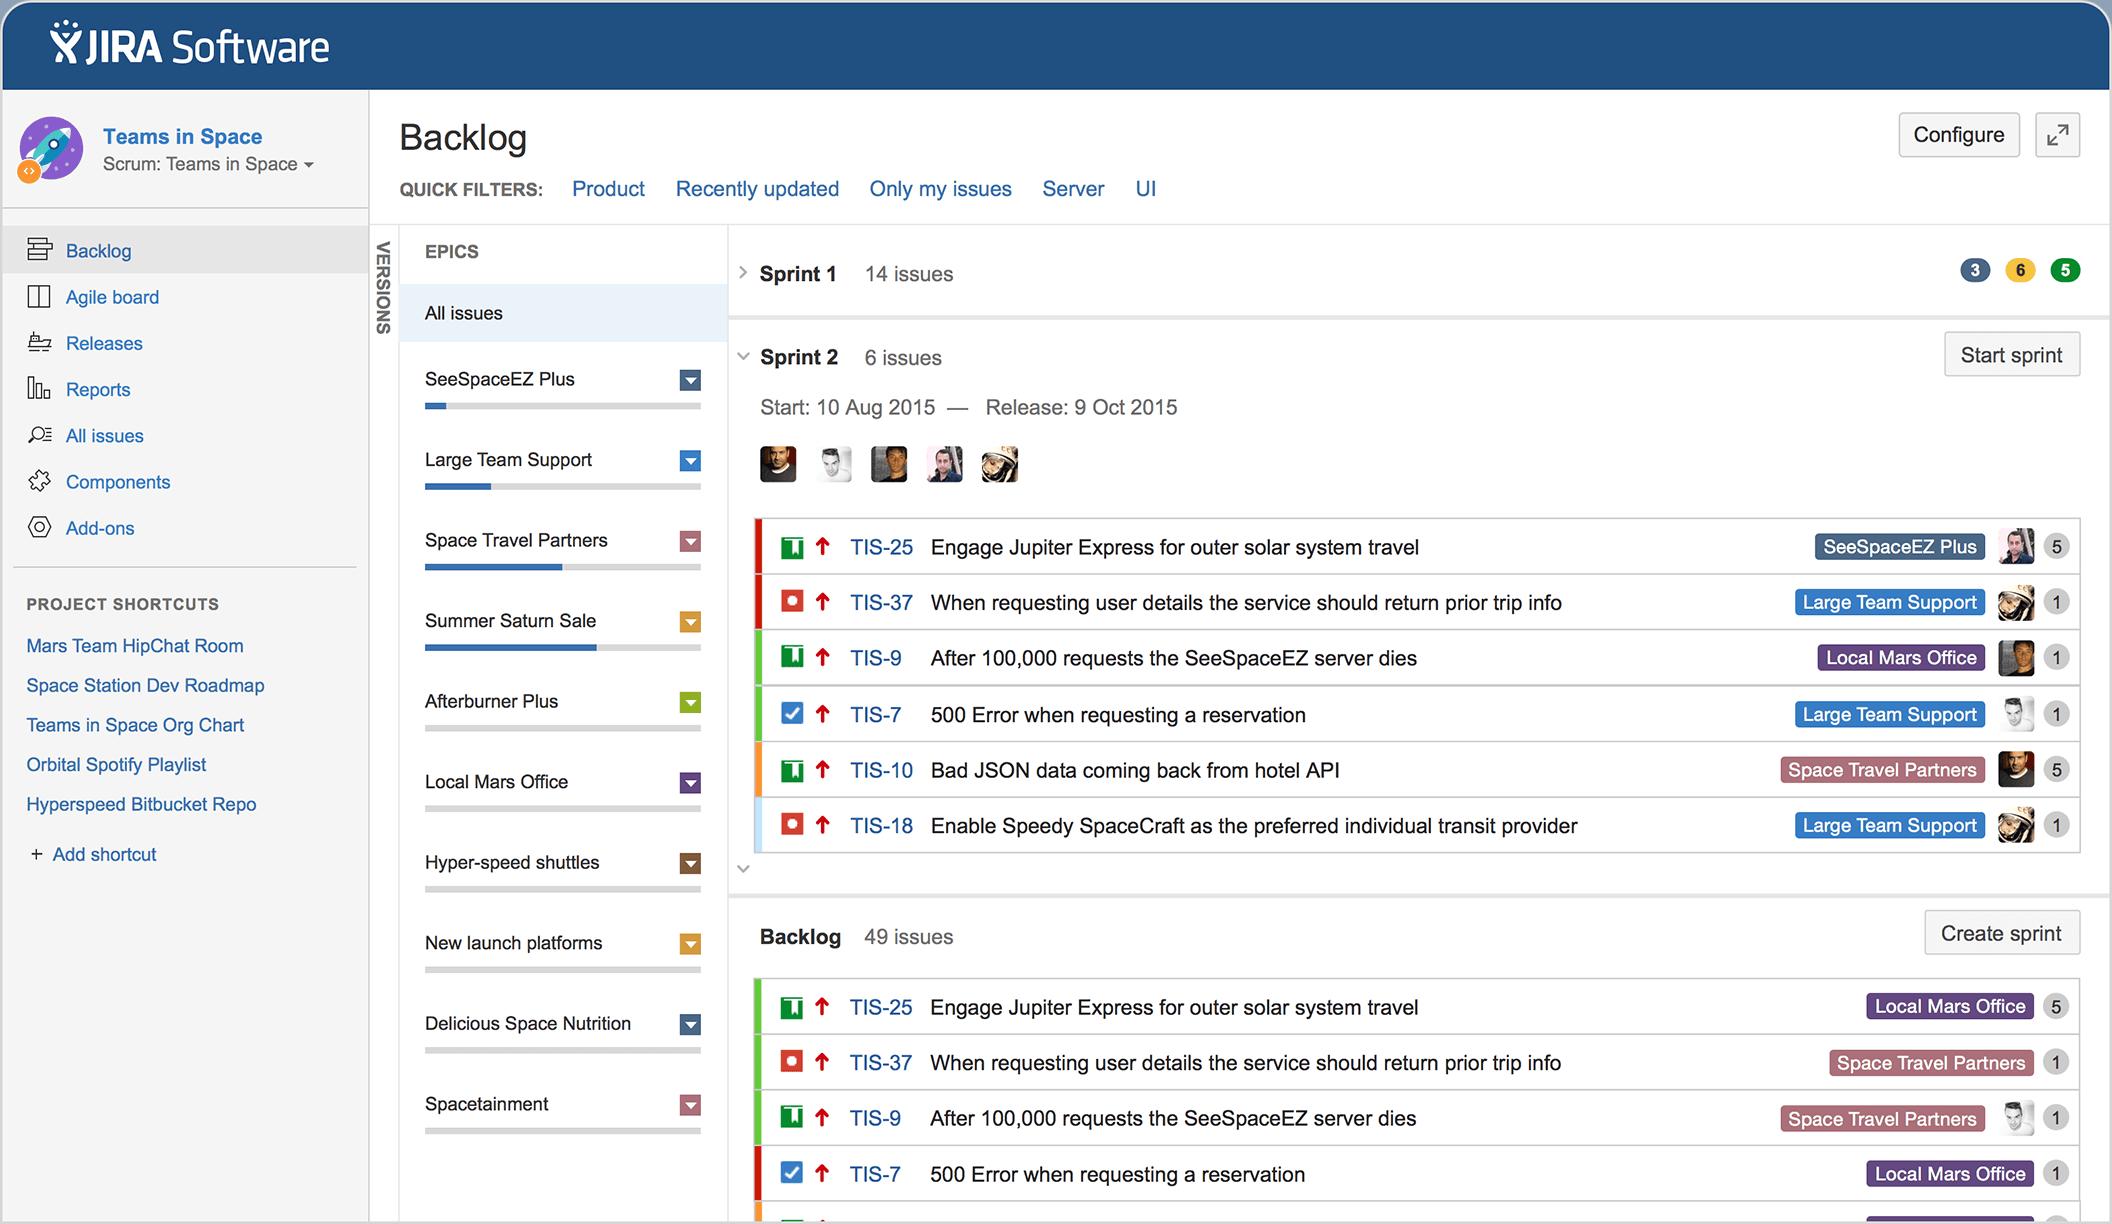 outil-gestion-projet-jira-software-planifier